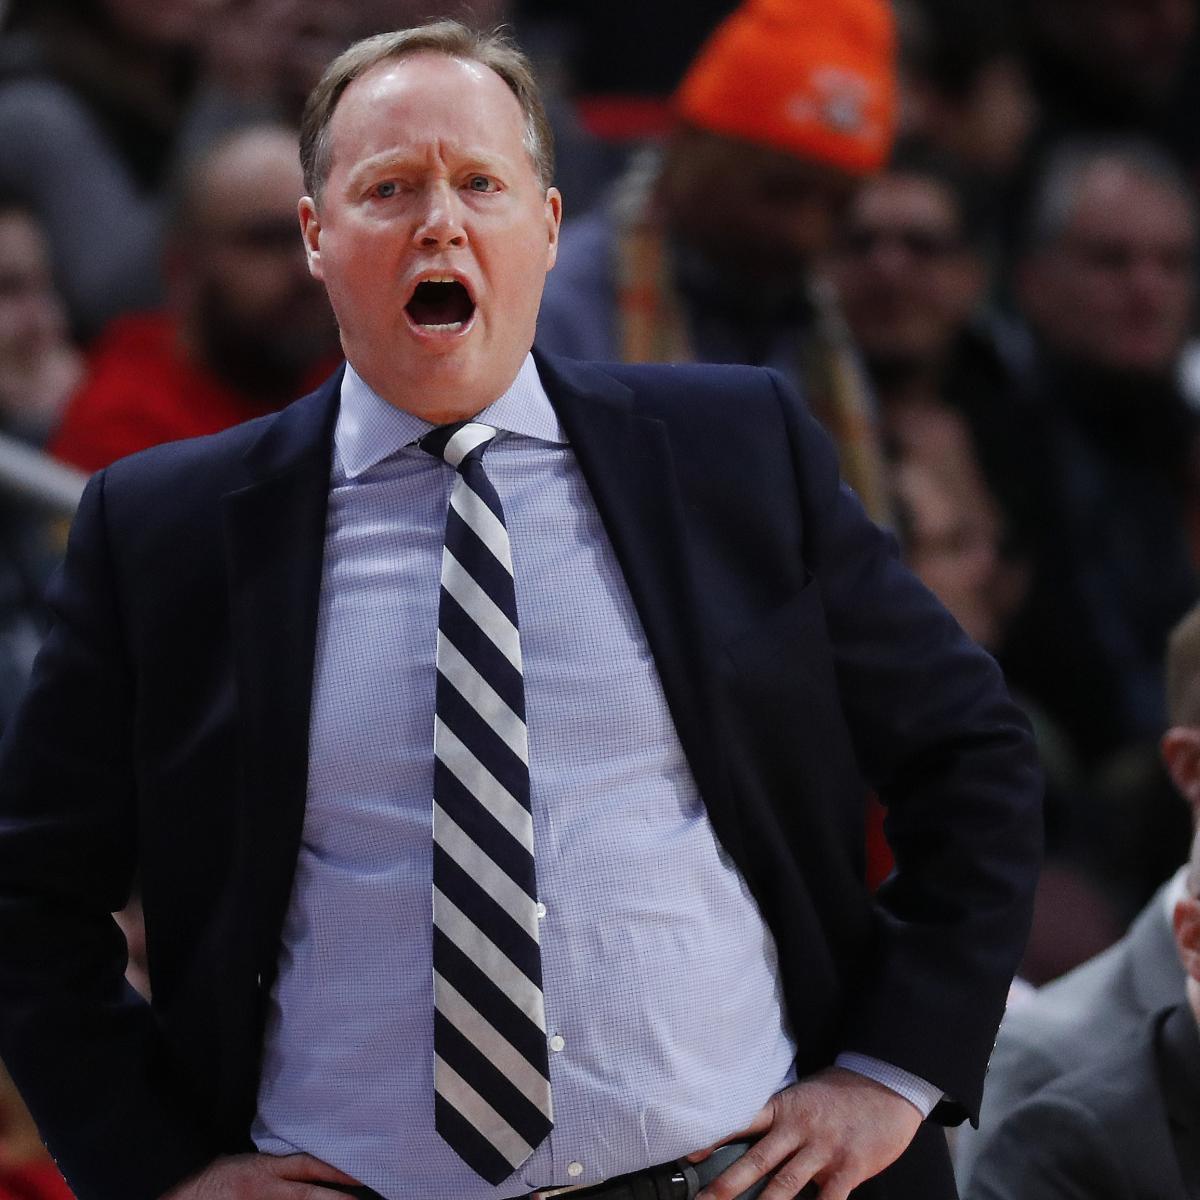 Bucks' Mike Budenholzer To Coach Team Giannis At 2019 NBA